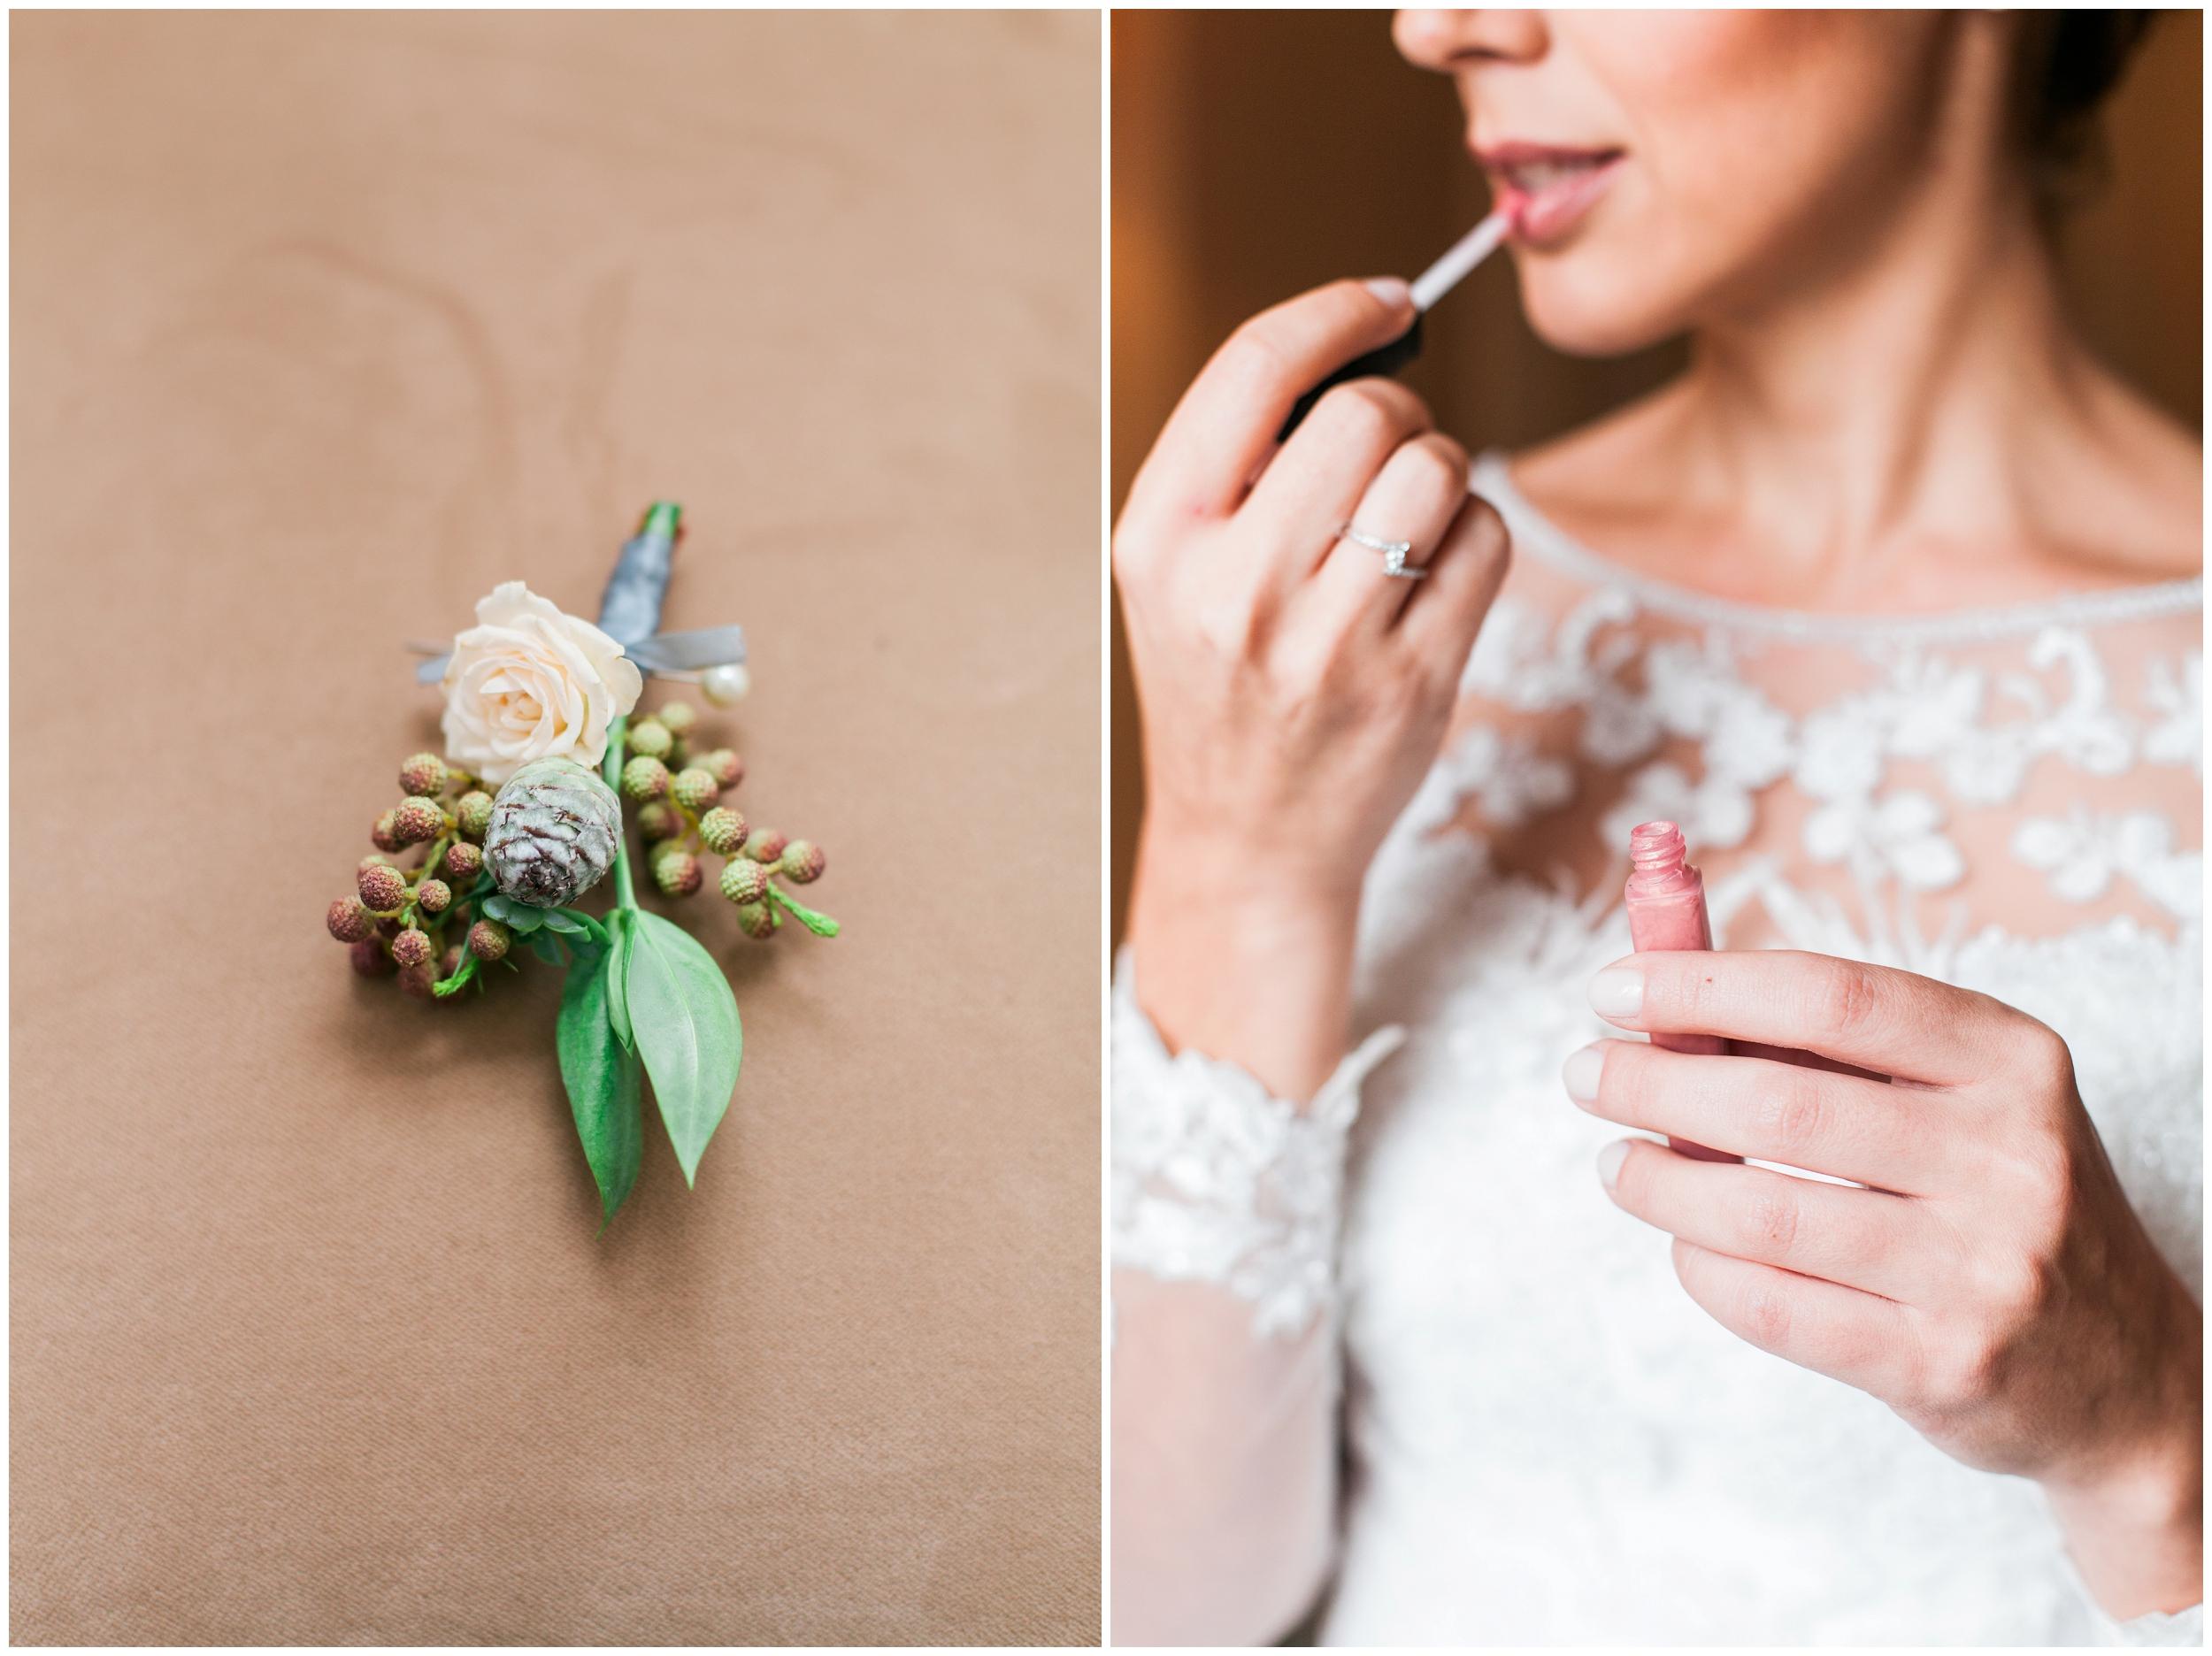 maria+rao+photography+wedding+palacio+lousa_0002.jpg